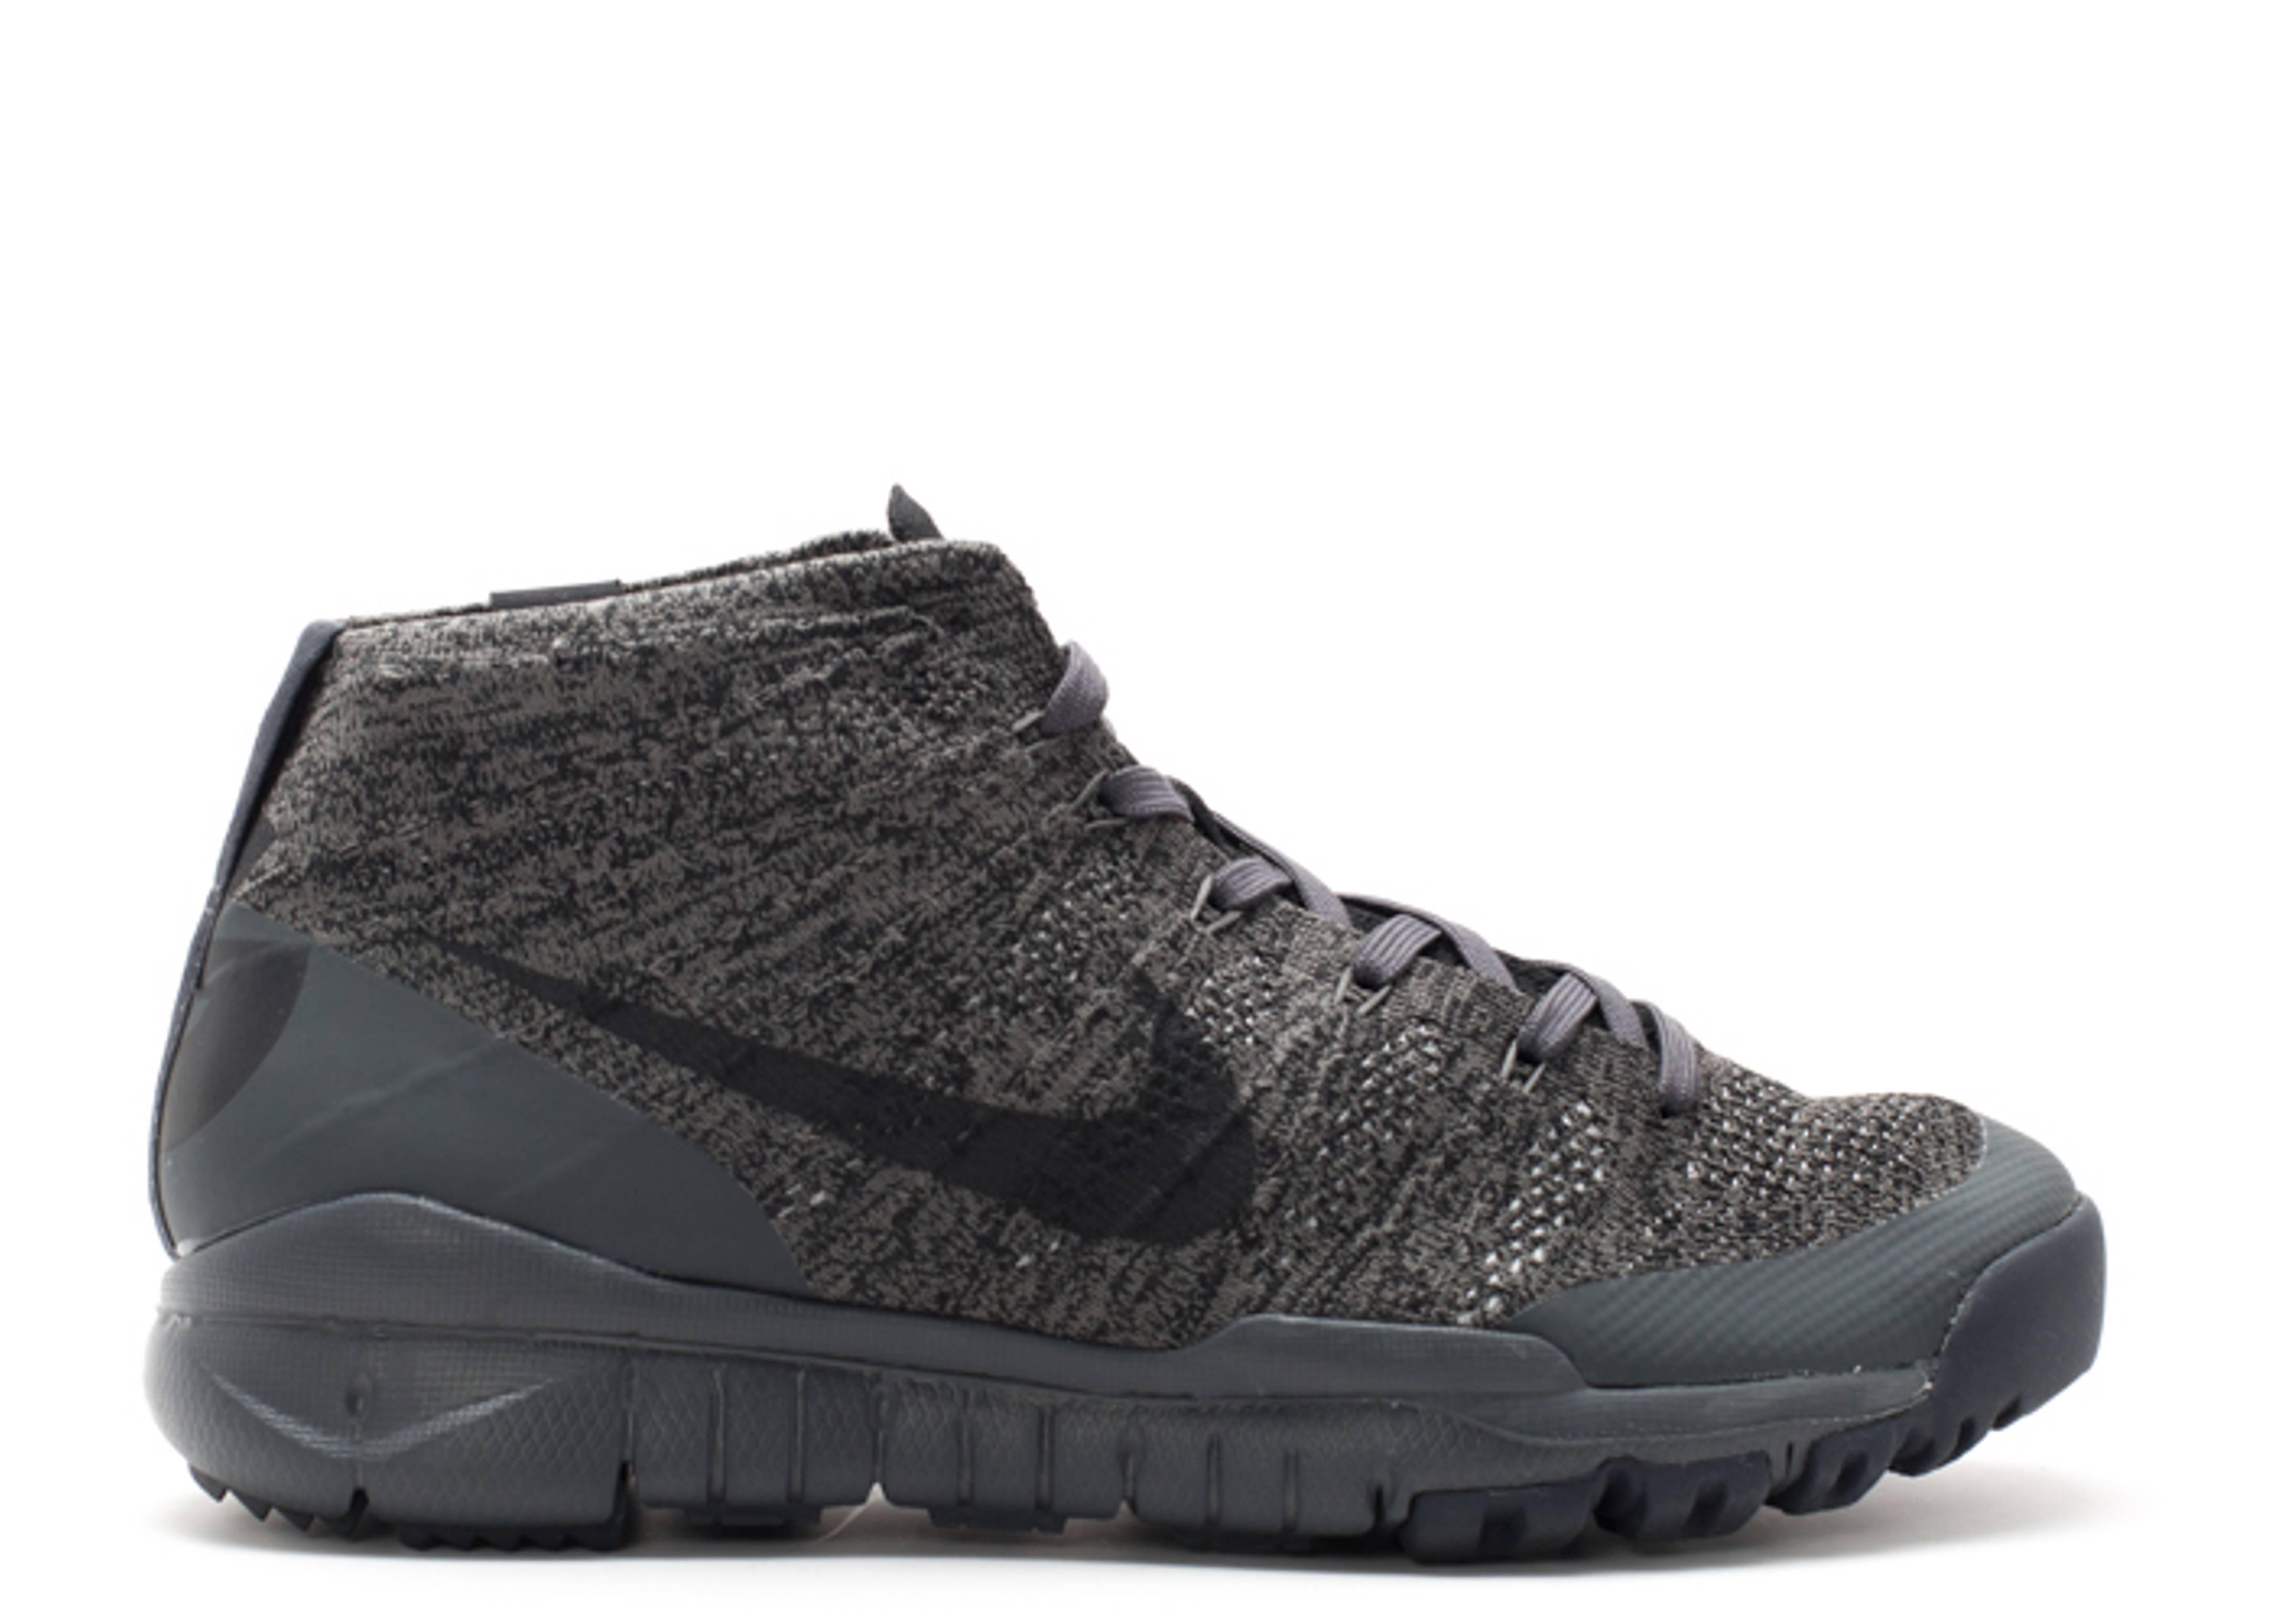 Mens Nike Lupinek Flyknit ACG 826077-001 Black//Black NEW Size 9.5